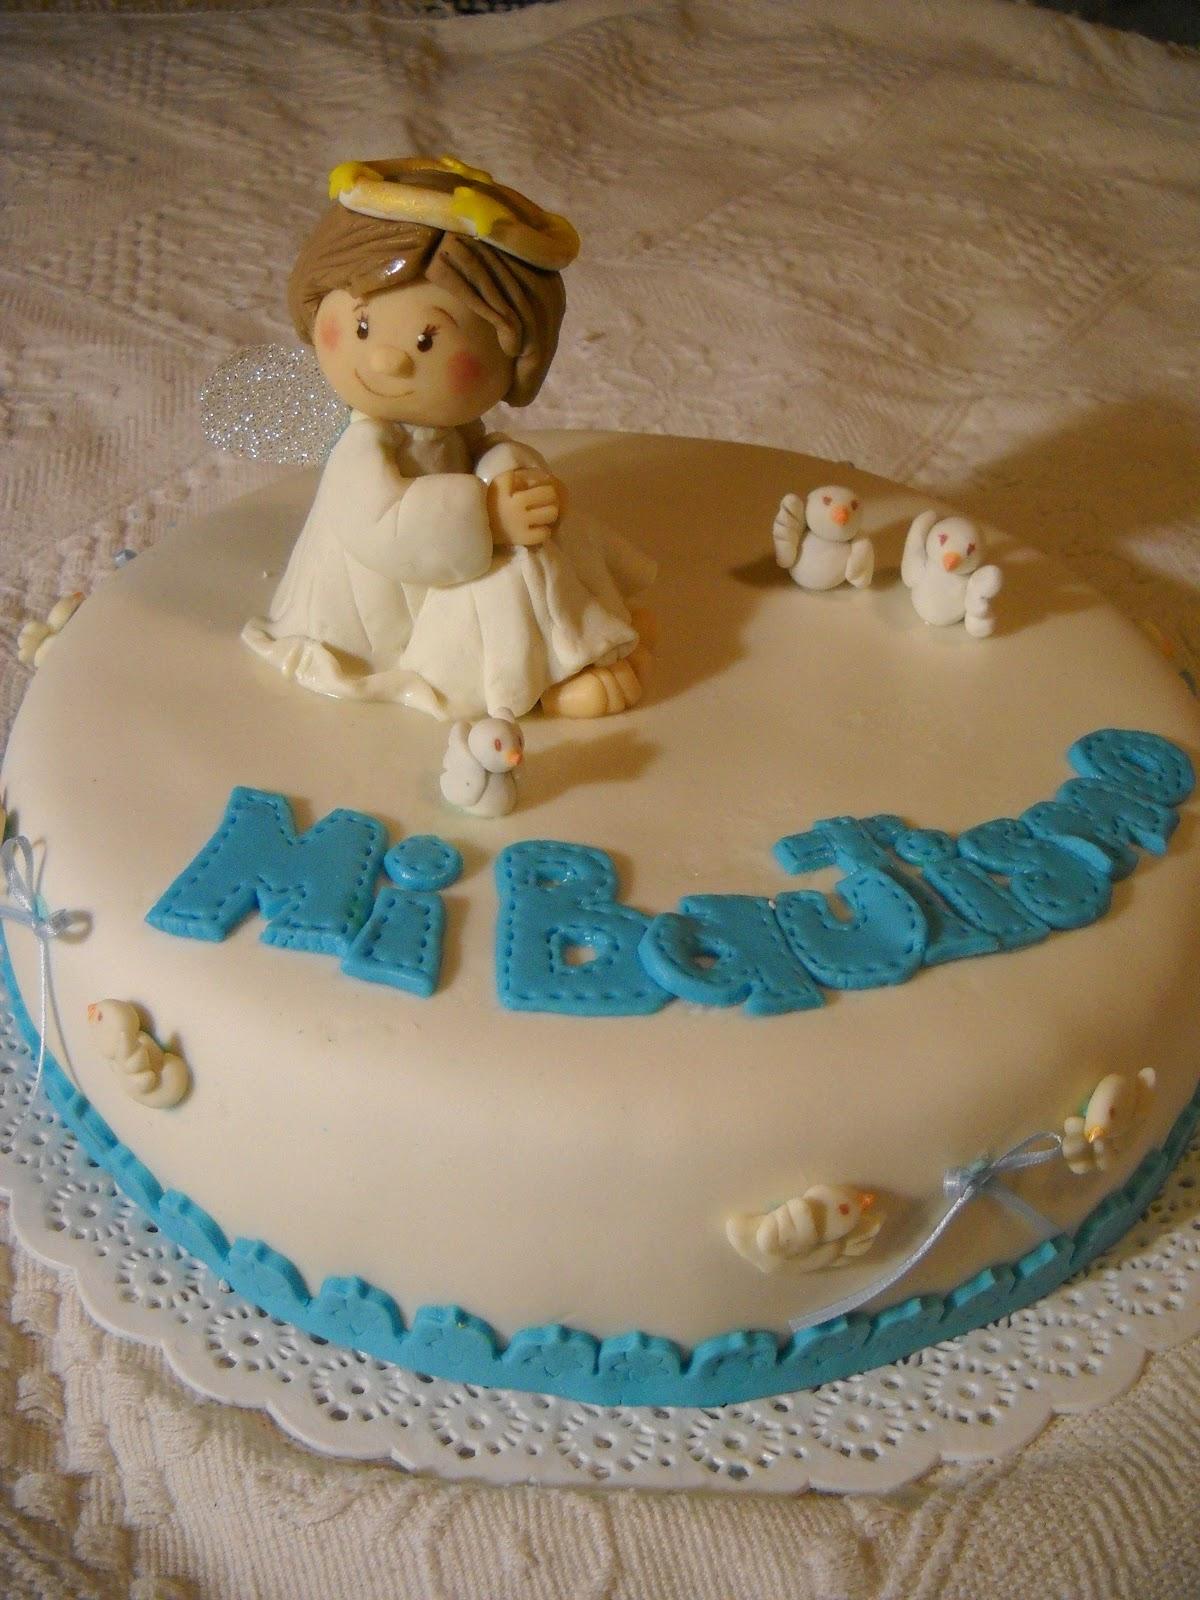 Mis Tortitas Decoradas: Torta de Bautismo con angelito